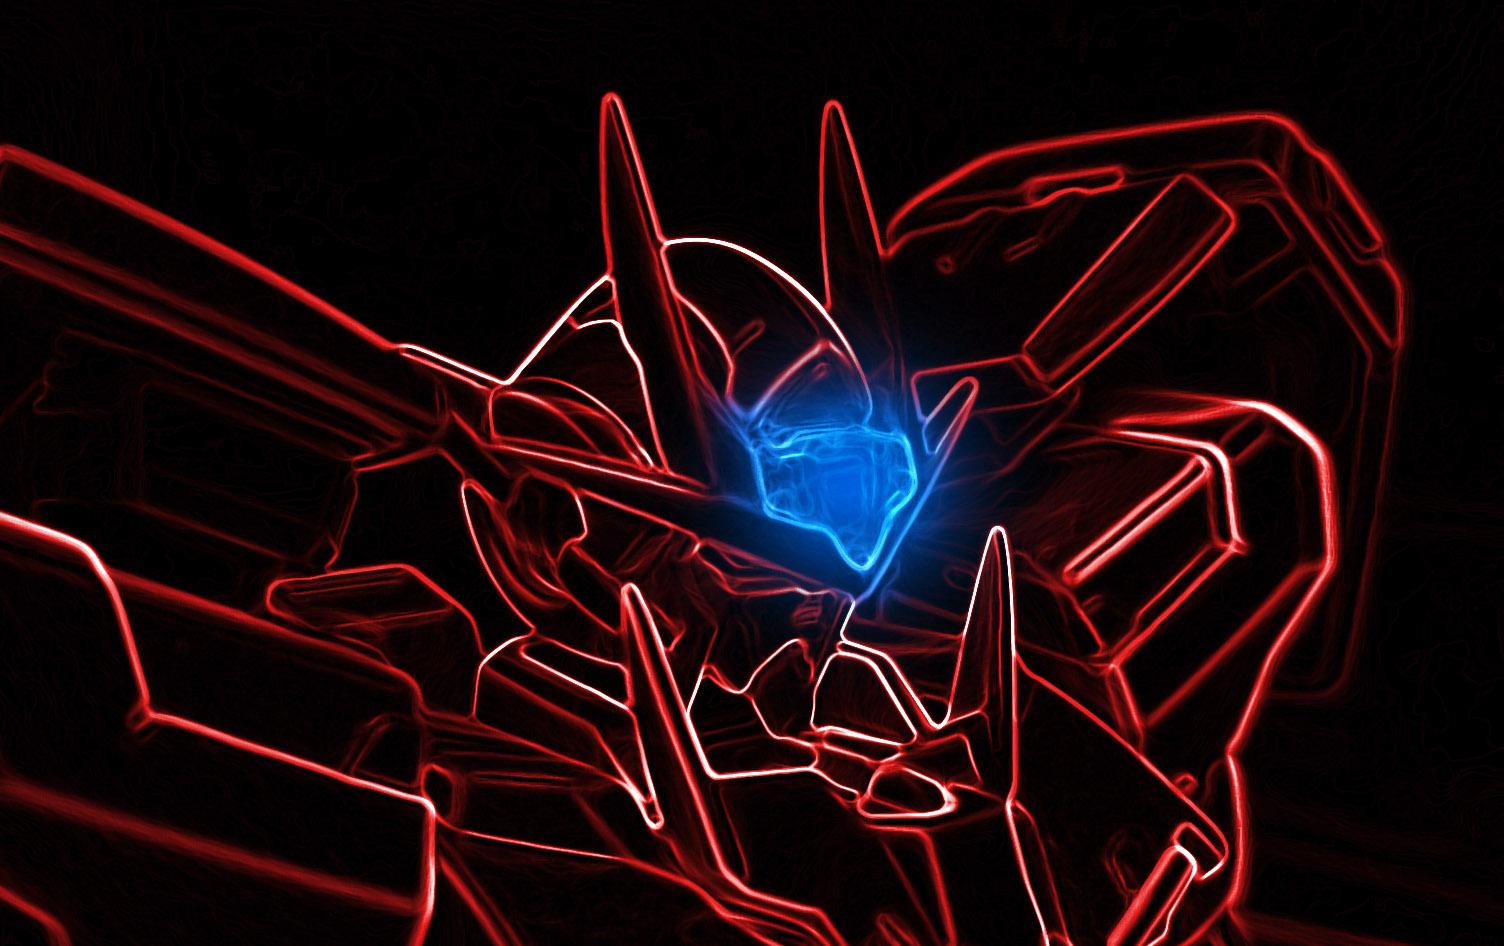 Gundam Hd Wallpaper 00 hd wallon 1504x946